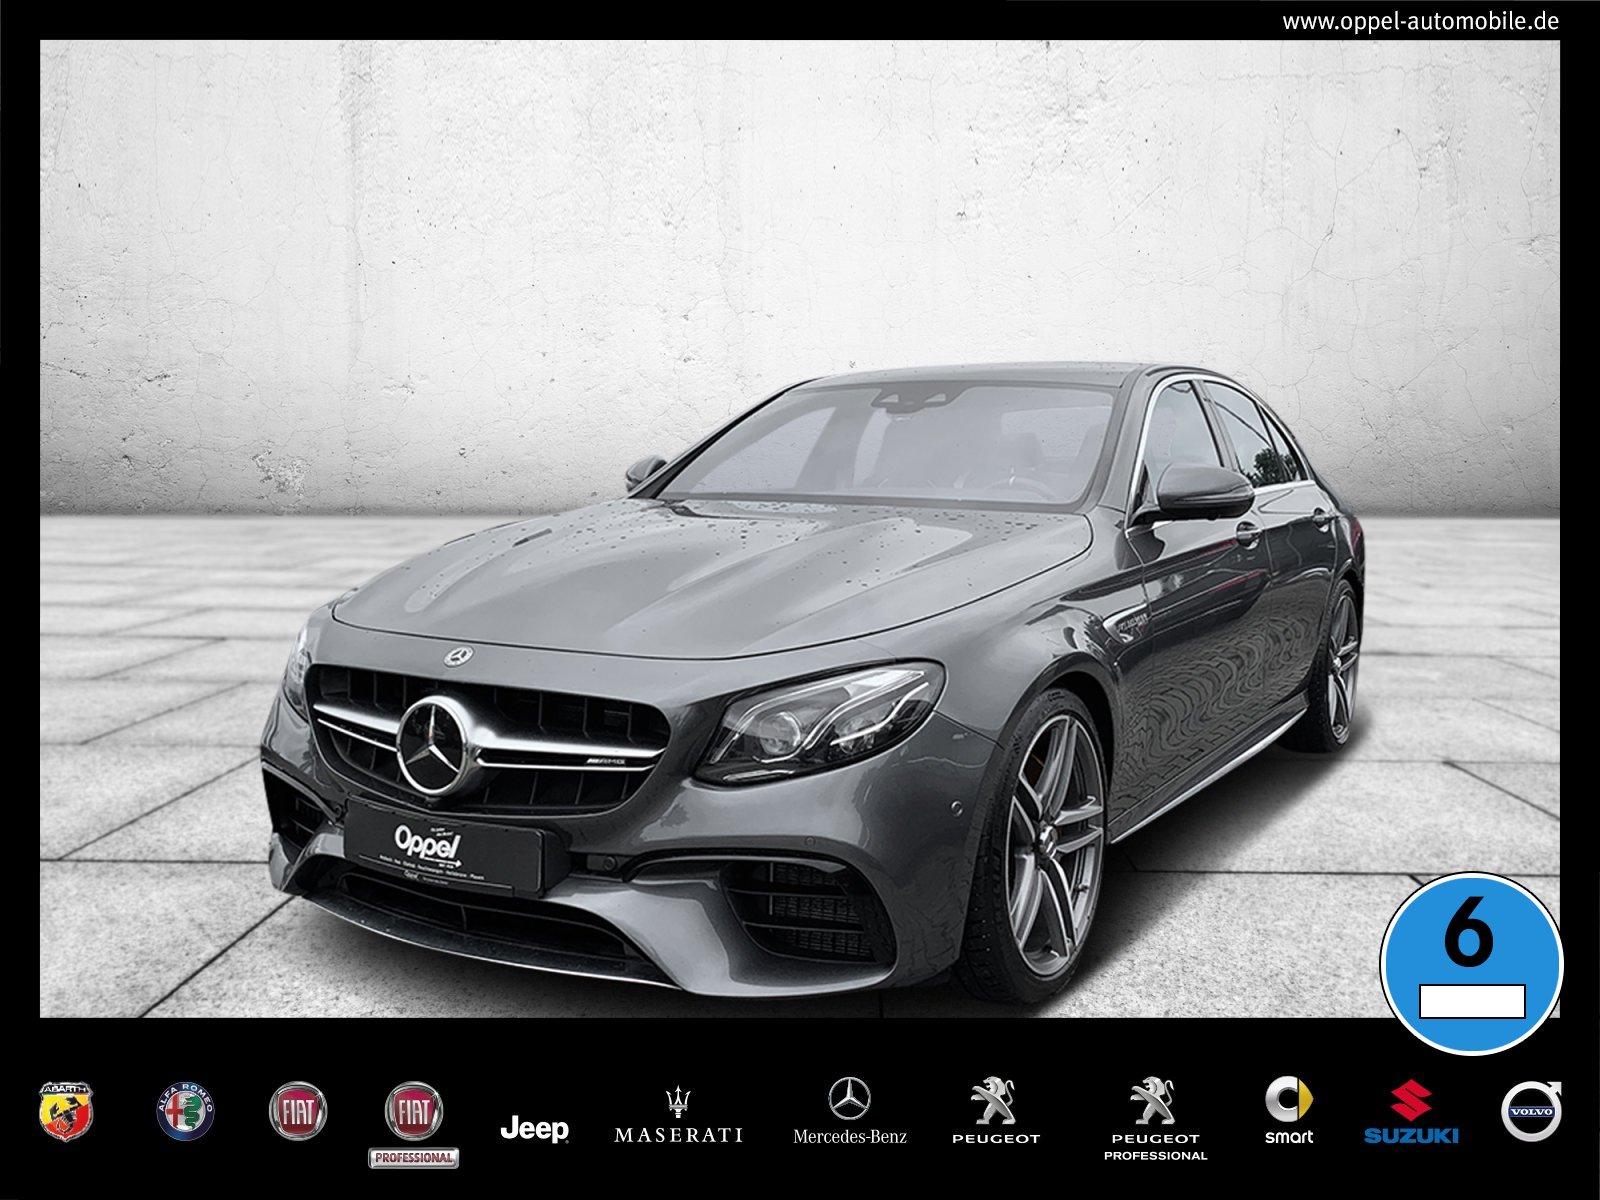 Mercedes-Benz AMG E 63 S 4Matic KERAMIKBREMSE+LED+360°+SITZH.+, Jahr 2018, Benzin